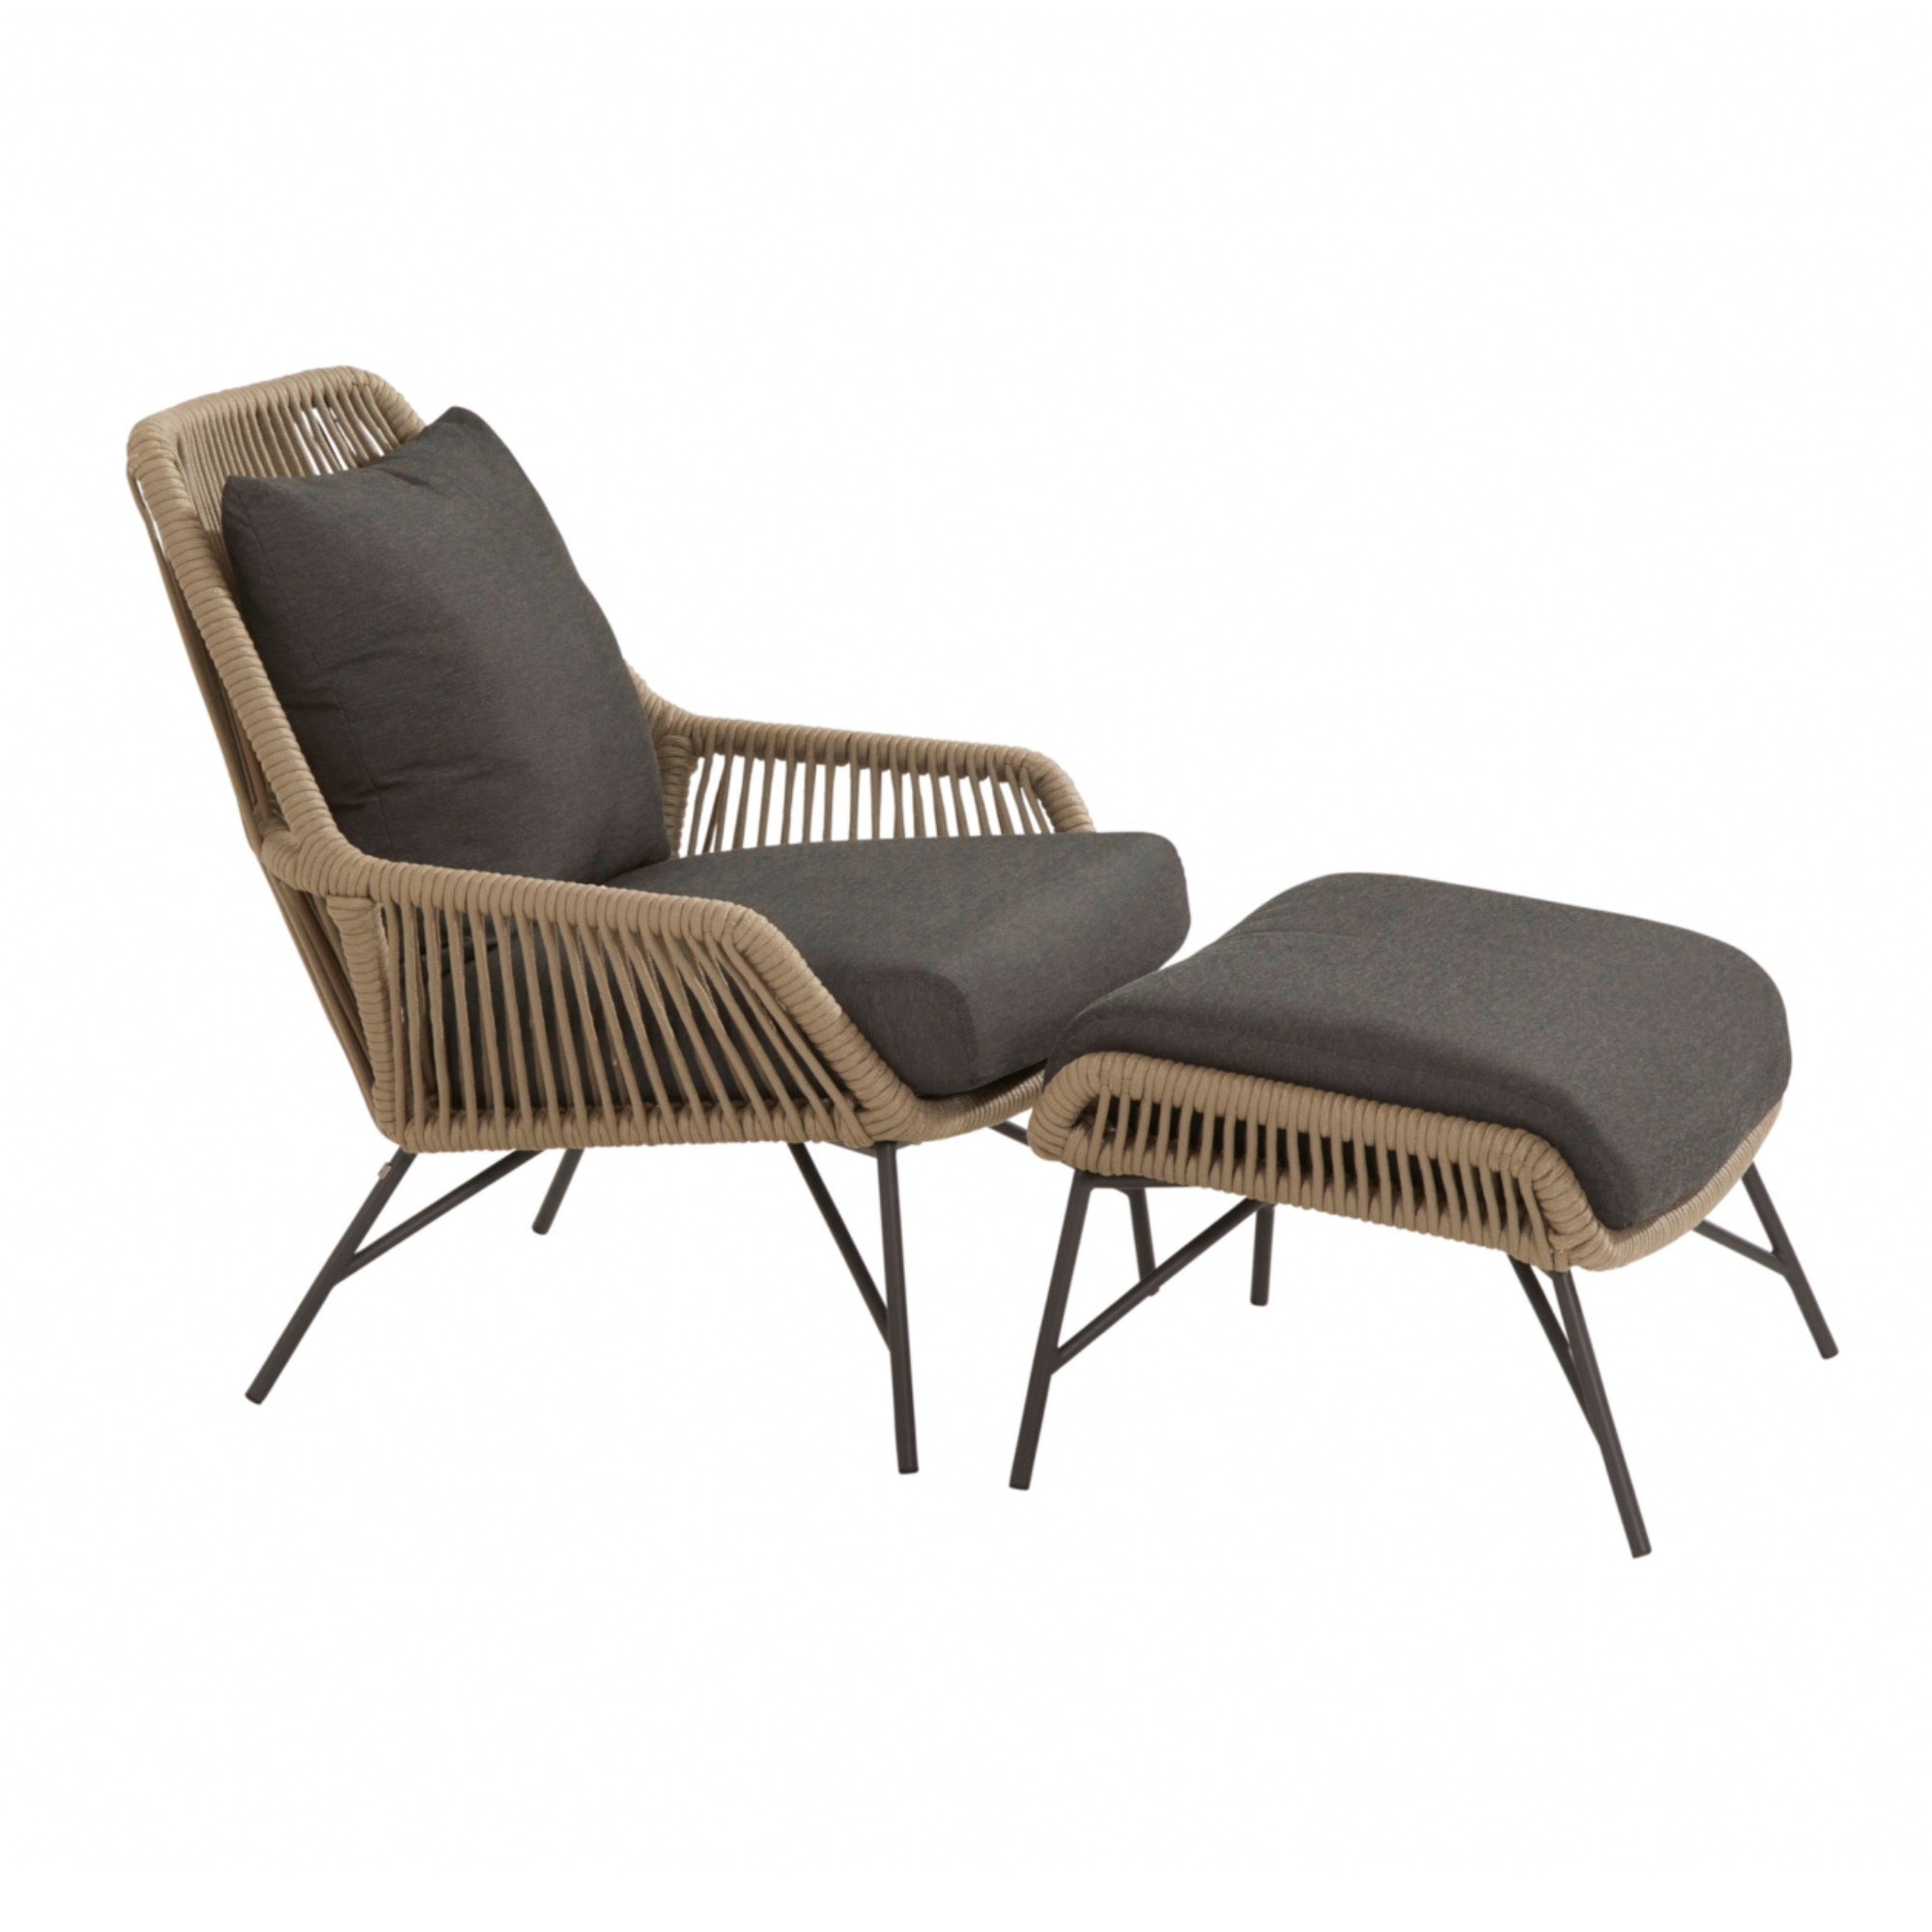 4 Seasons Ramblas Footstool W/Cushions - Taupe